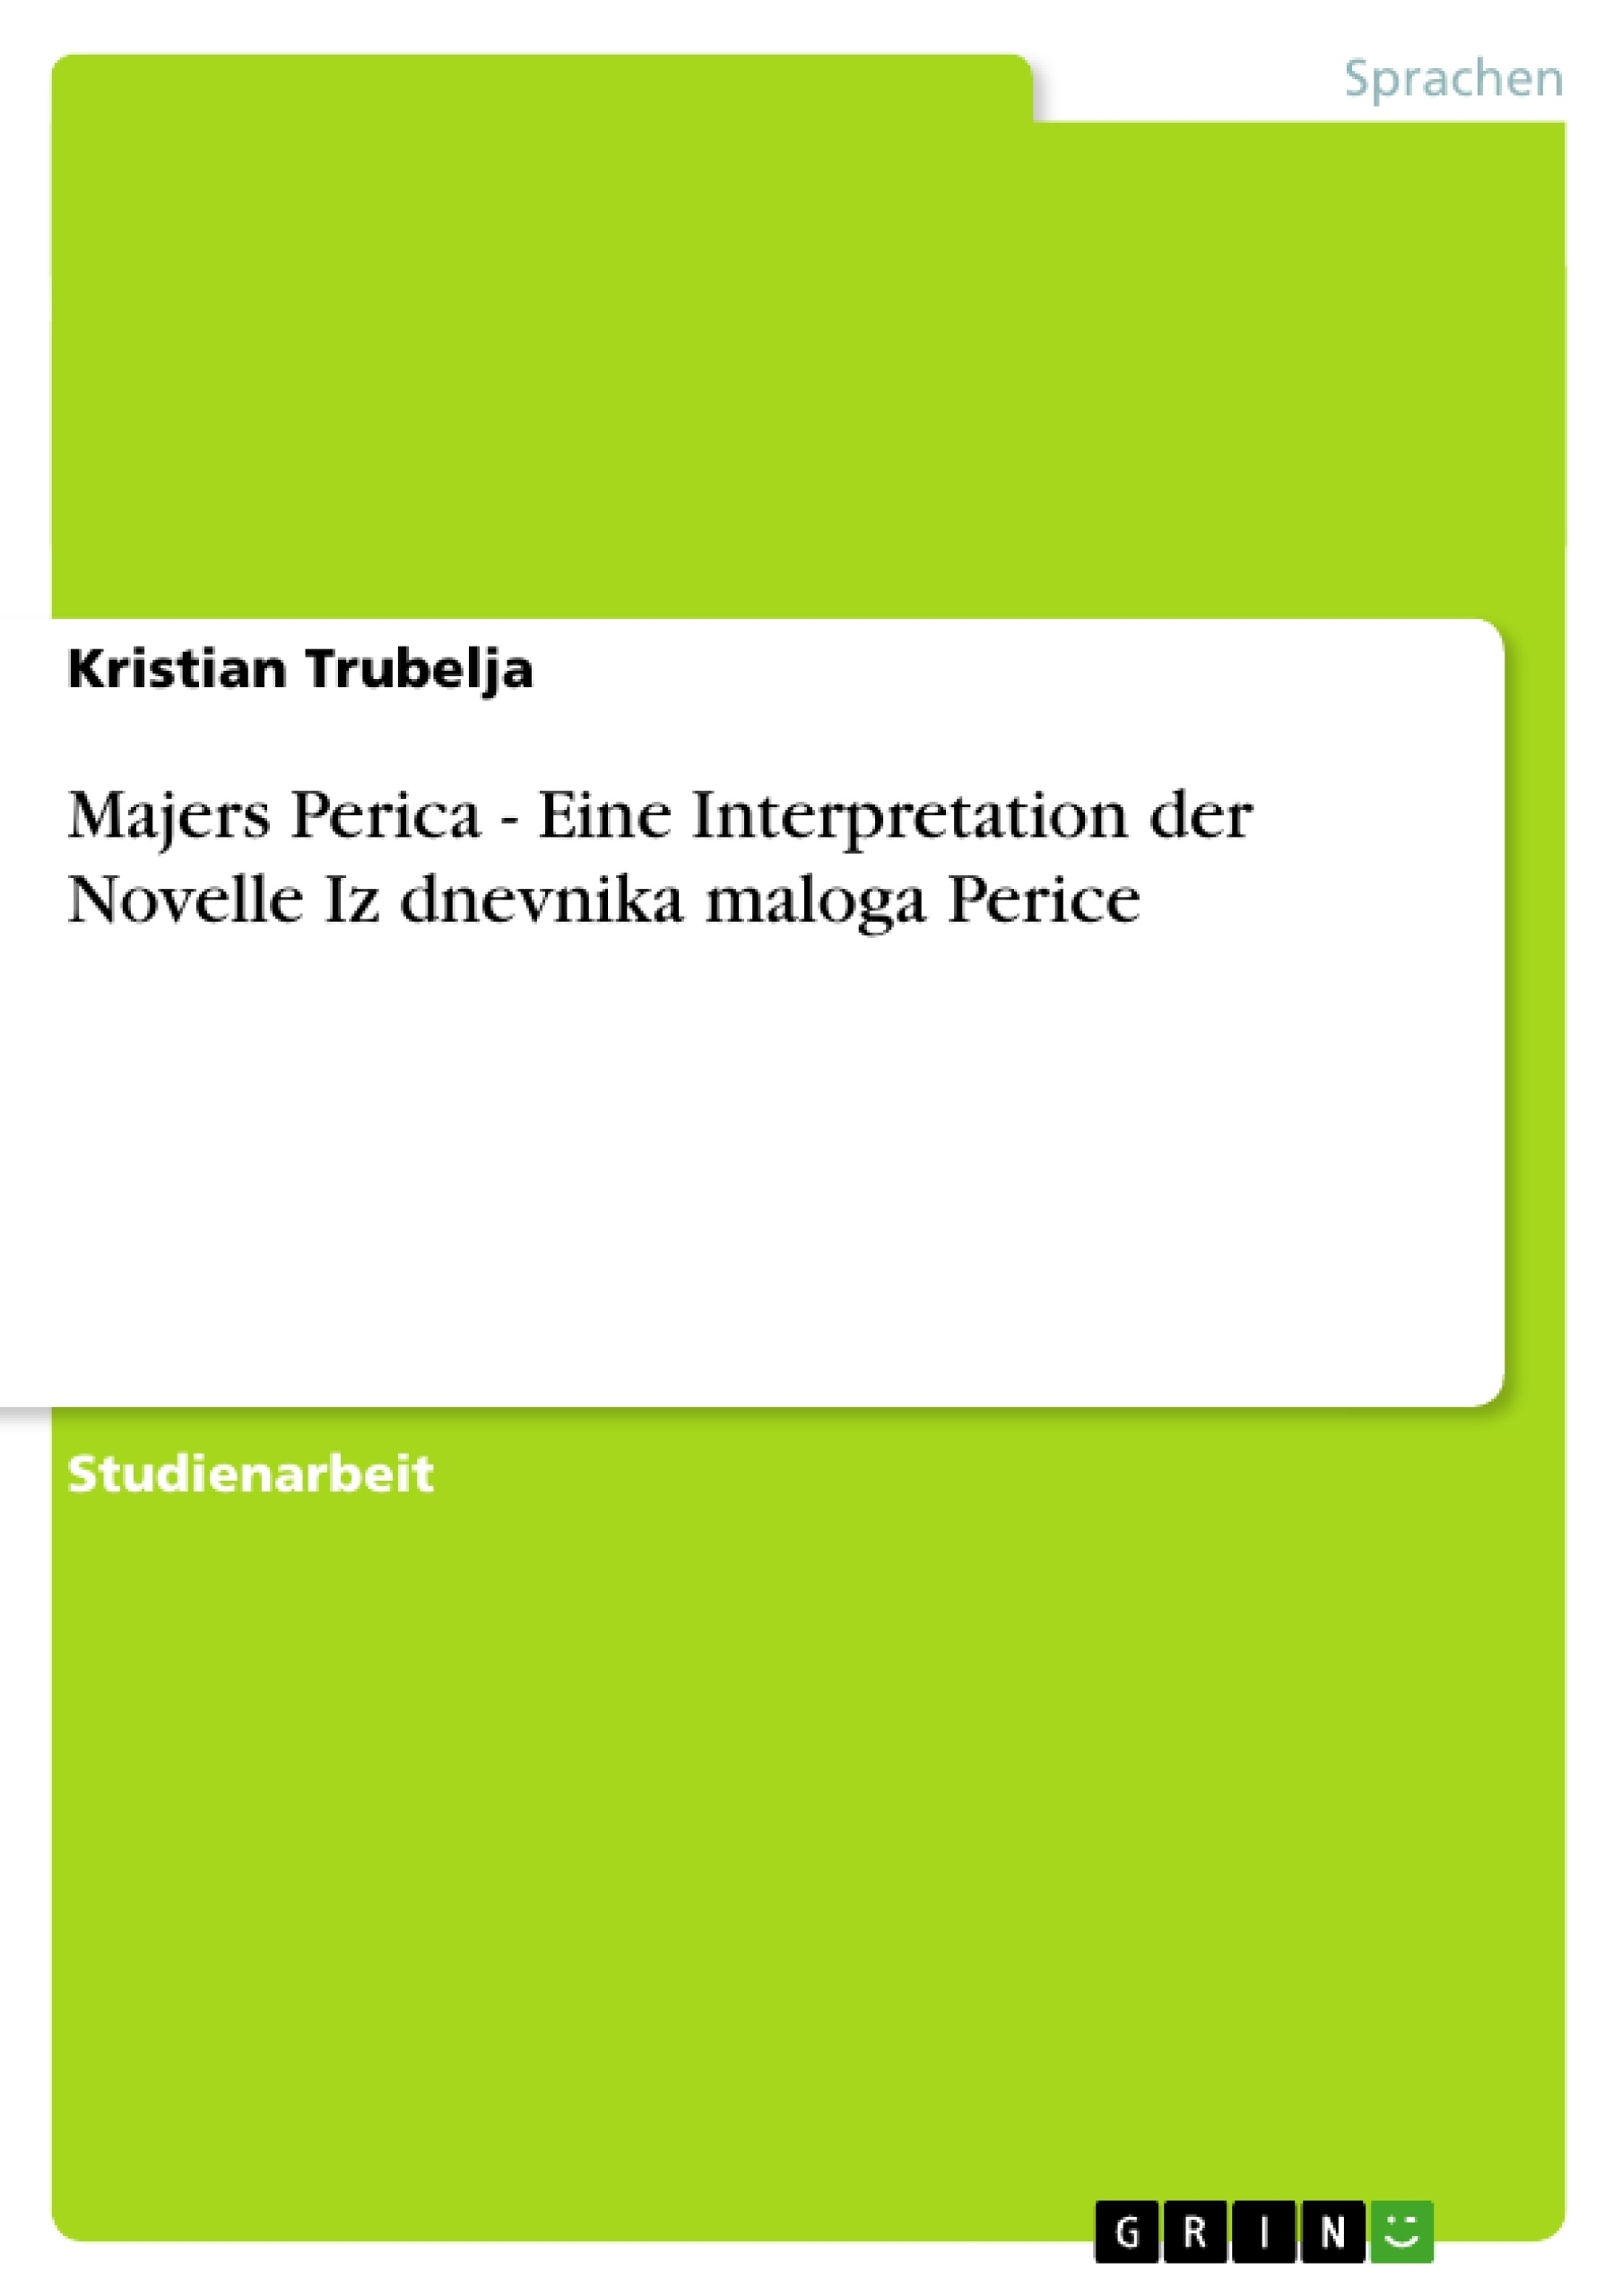 Titel: Majers Perica - Eine Interpretation der Novelle Iz dnevnika maloga Perice